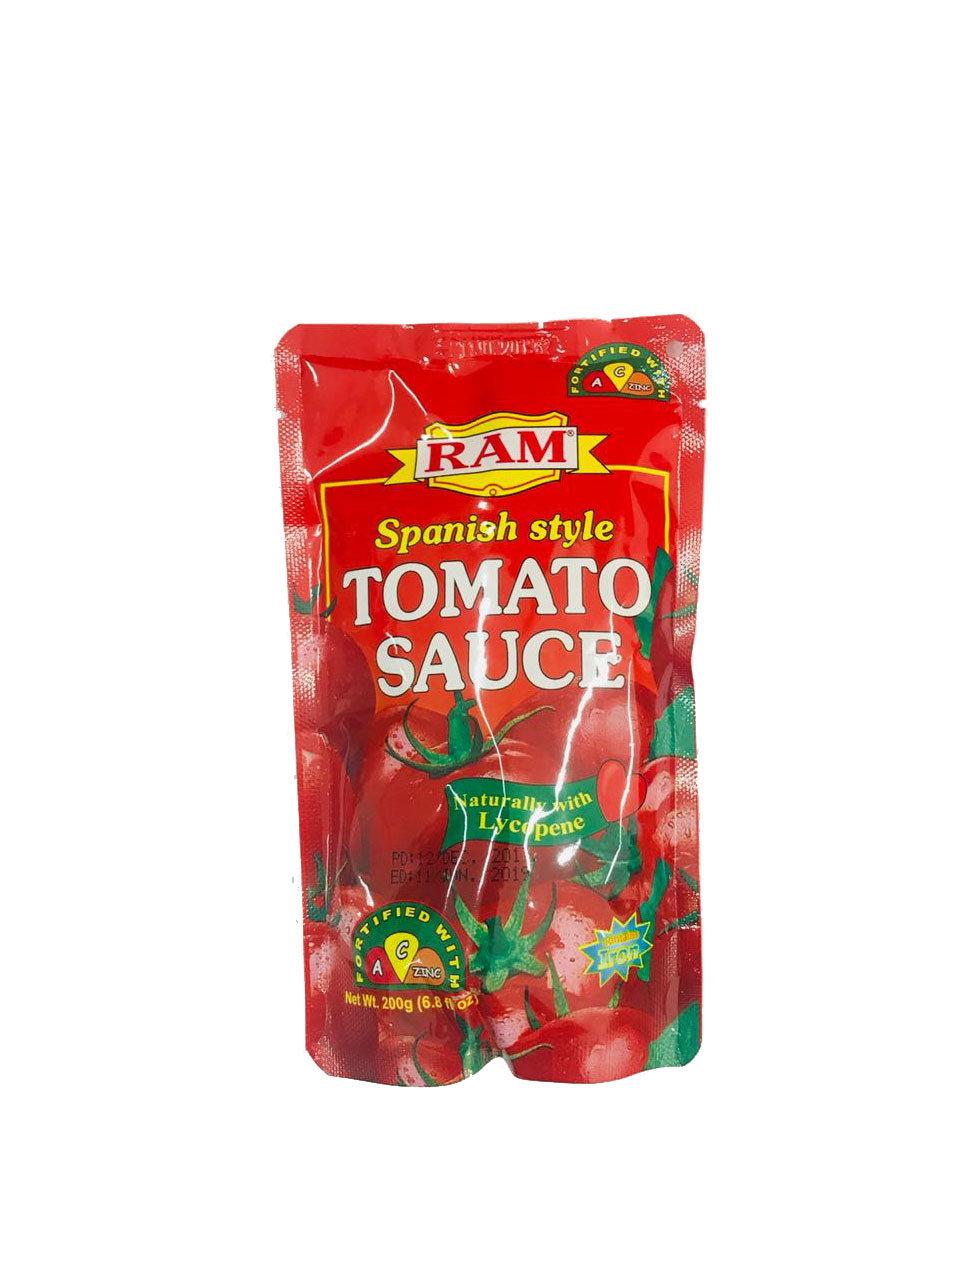 Ram Spanish Style Tomato Sauce 200g